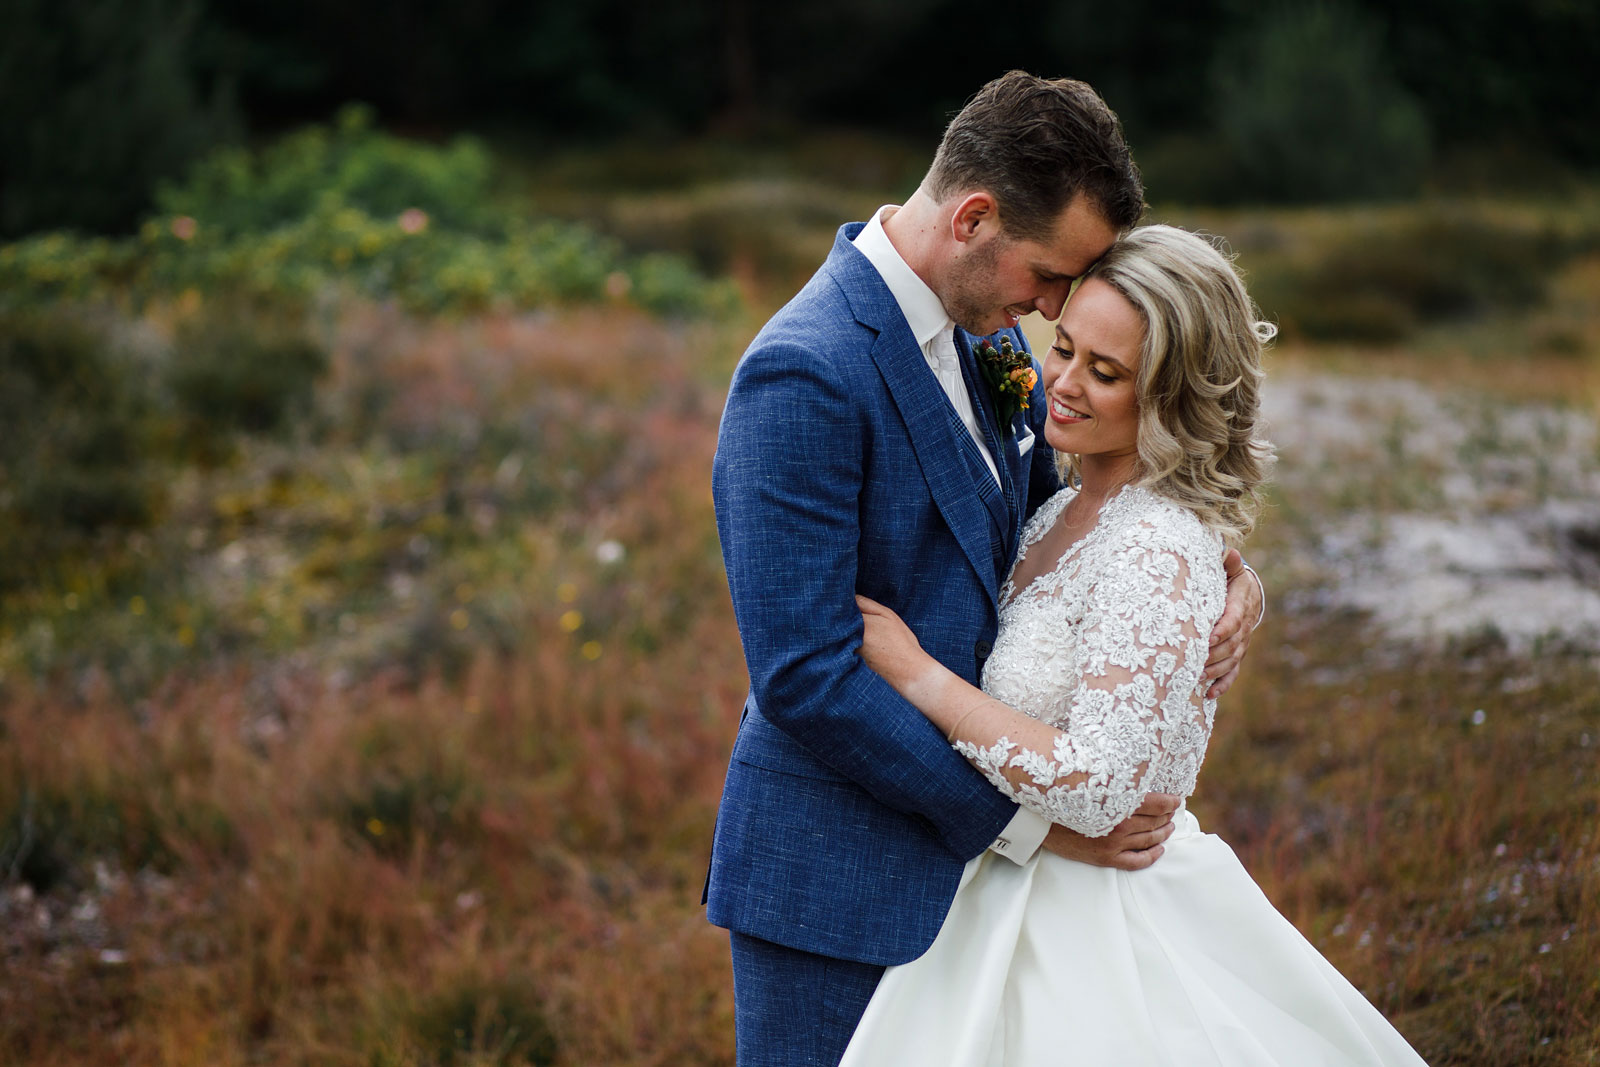 fotoshoot bruiloft noord holland